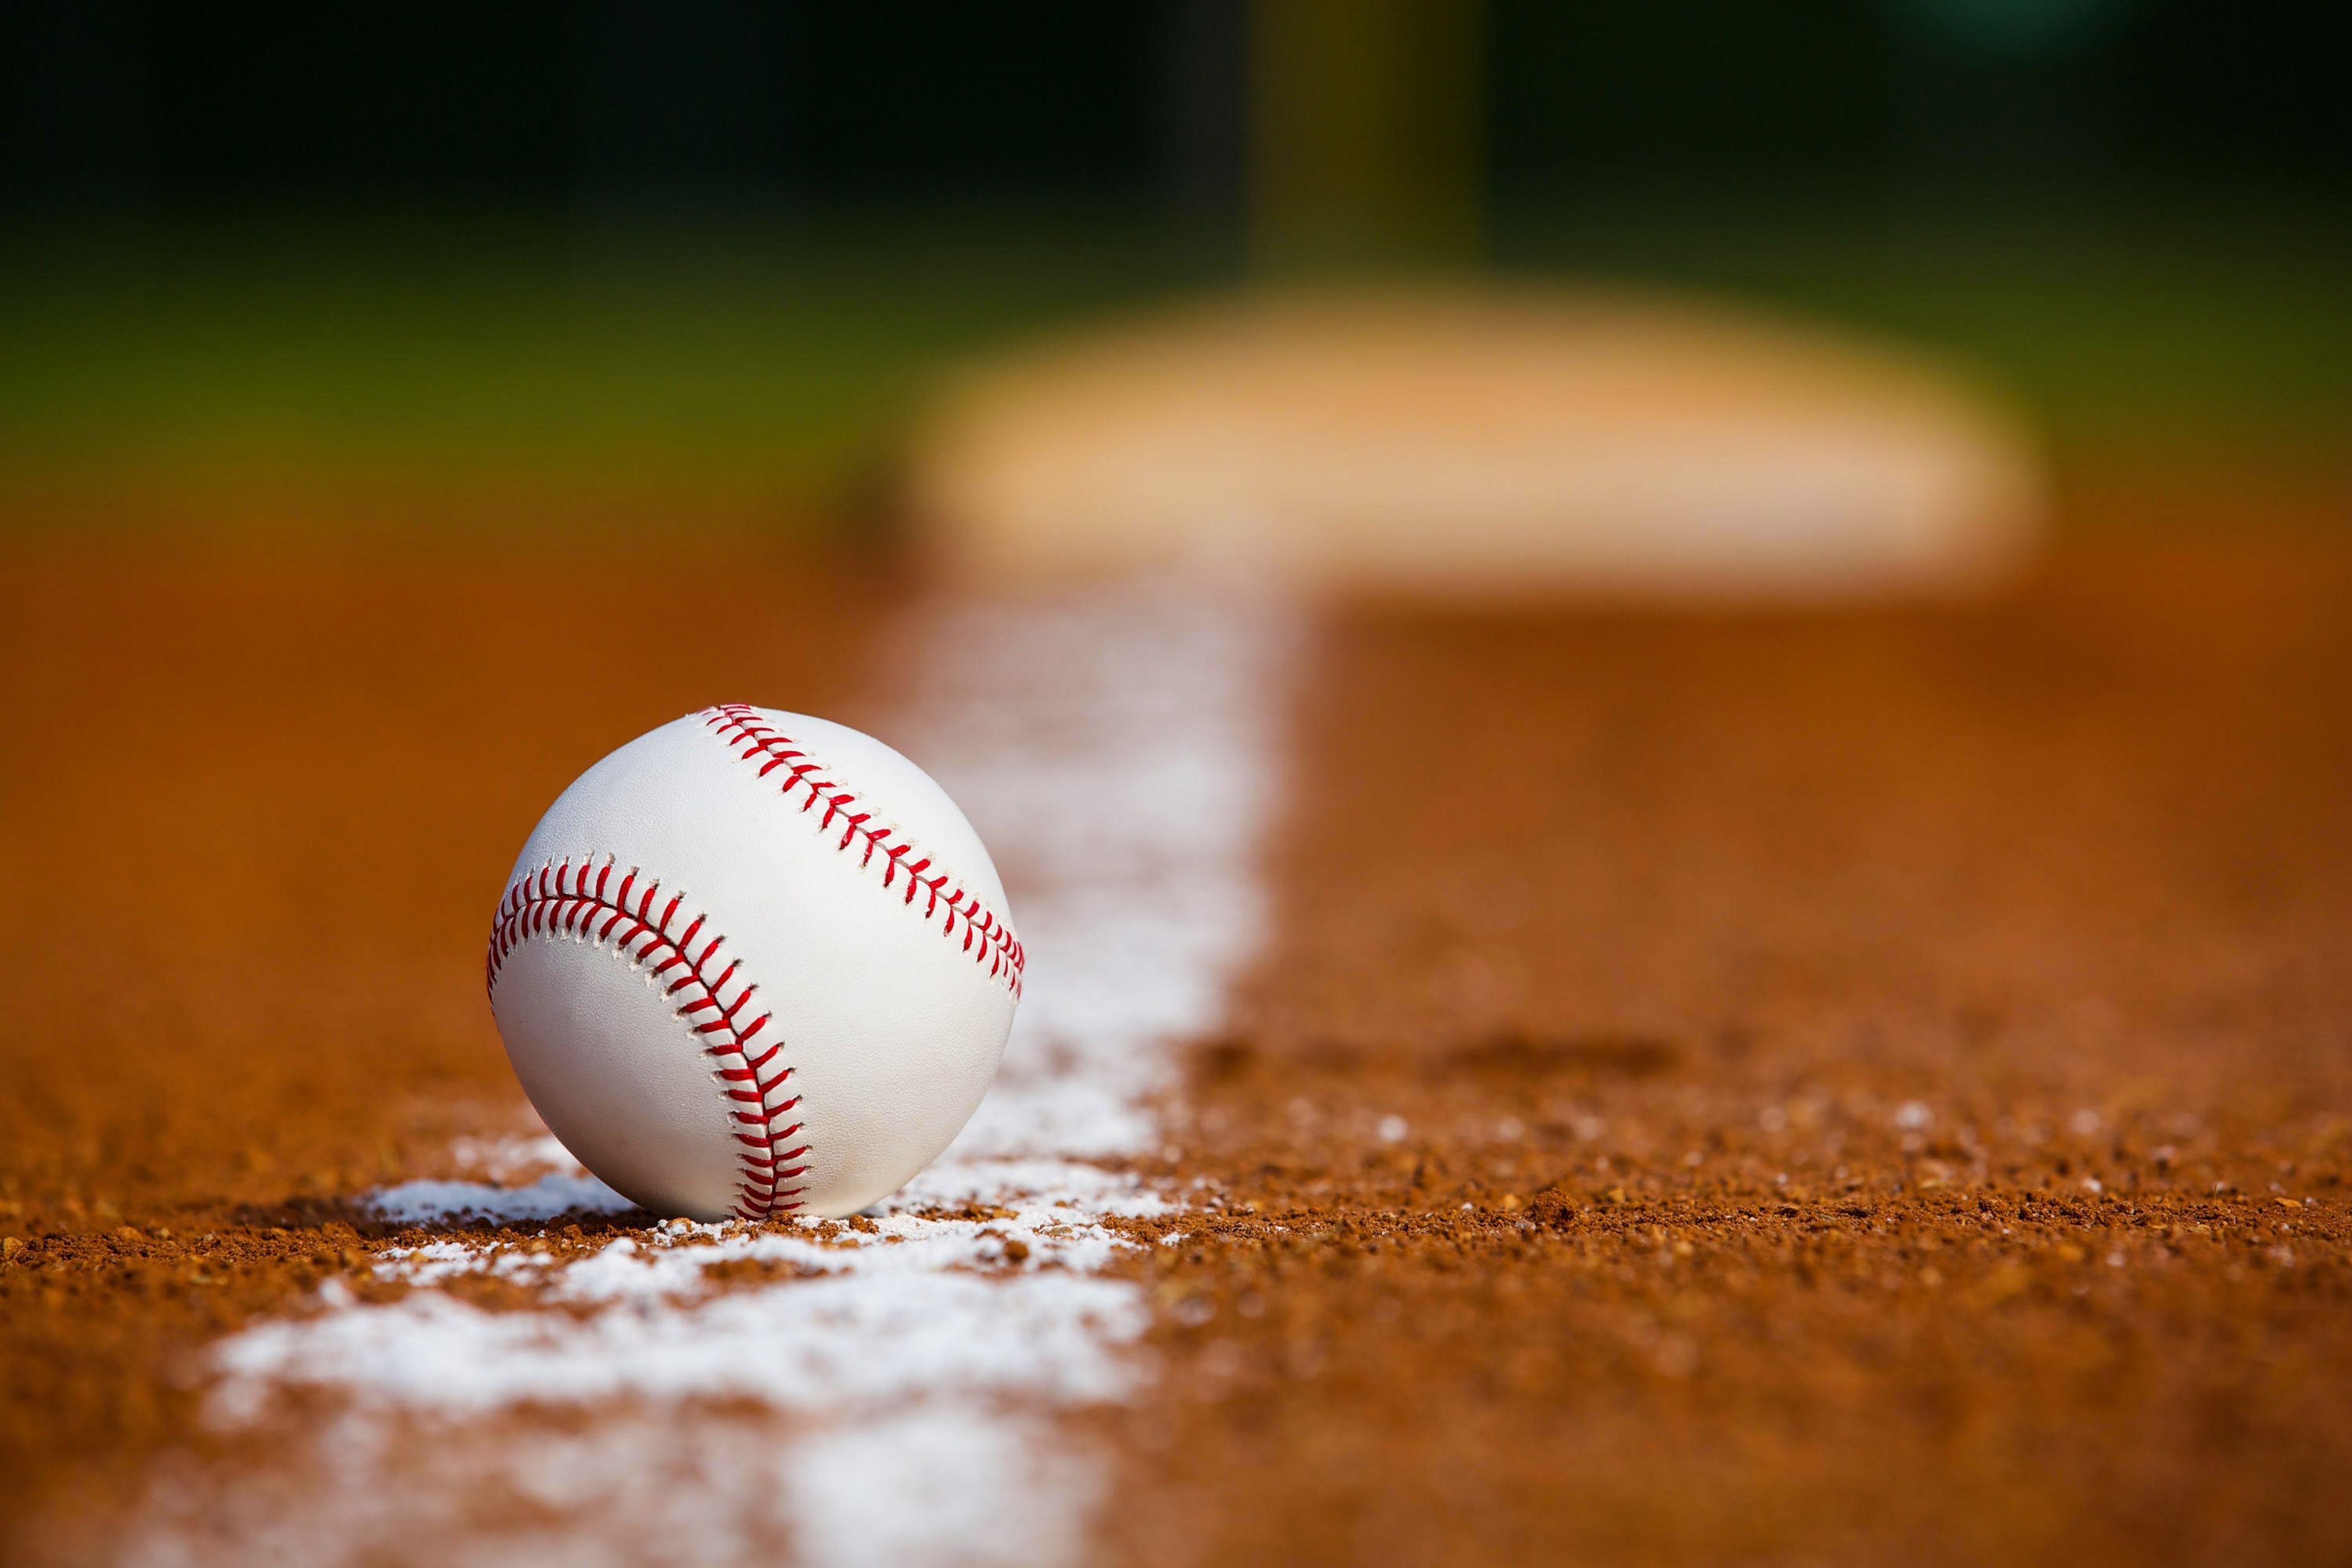 Baseball 4k Wallpapers Top Free Baseball 4k Backgrounds